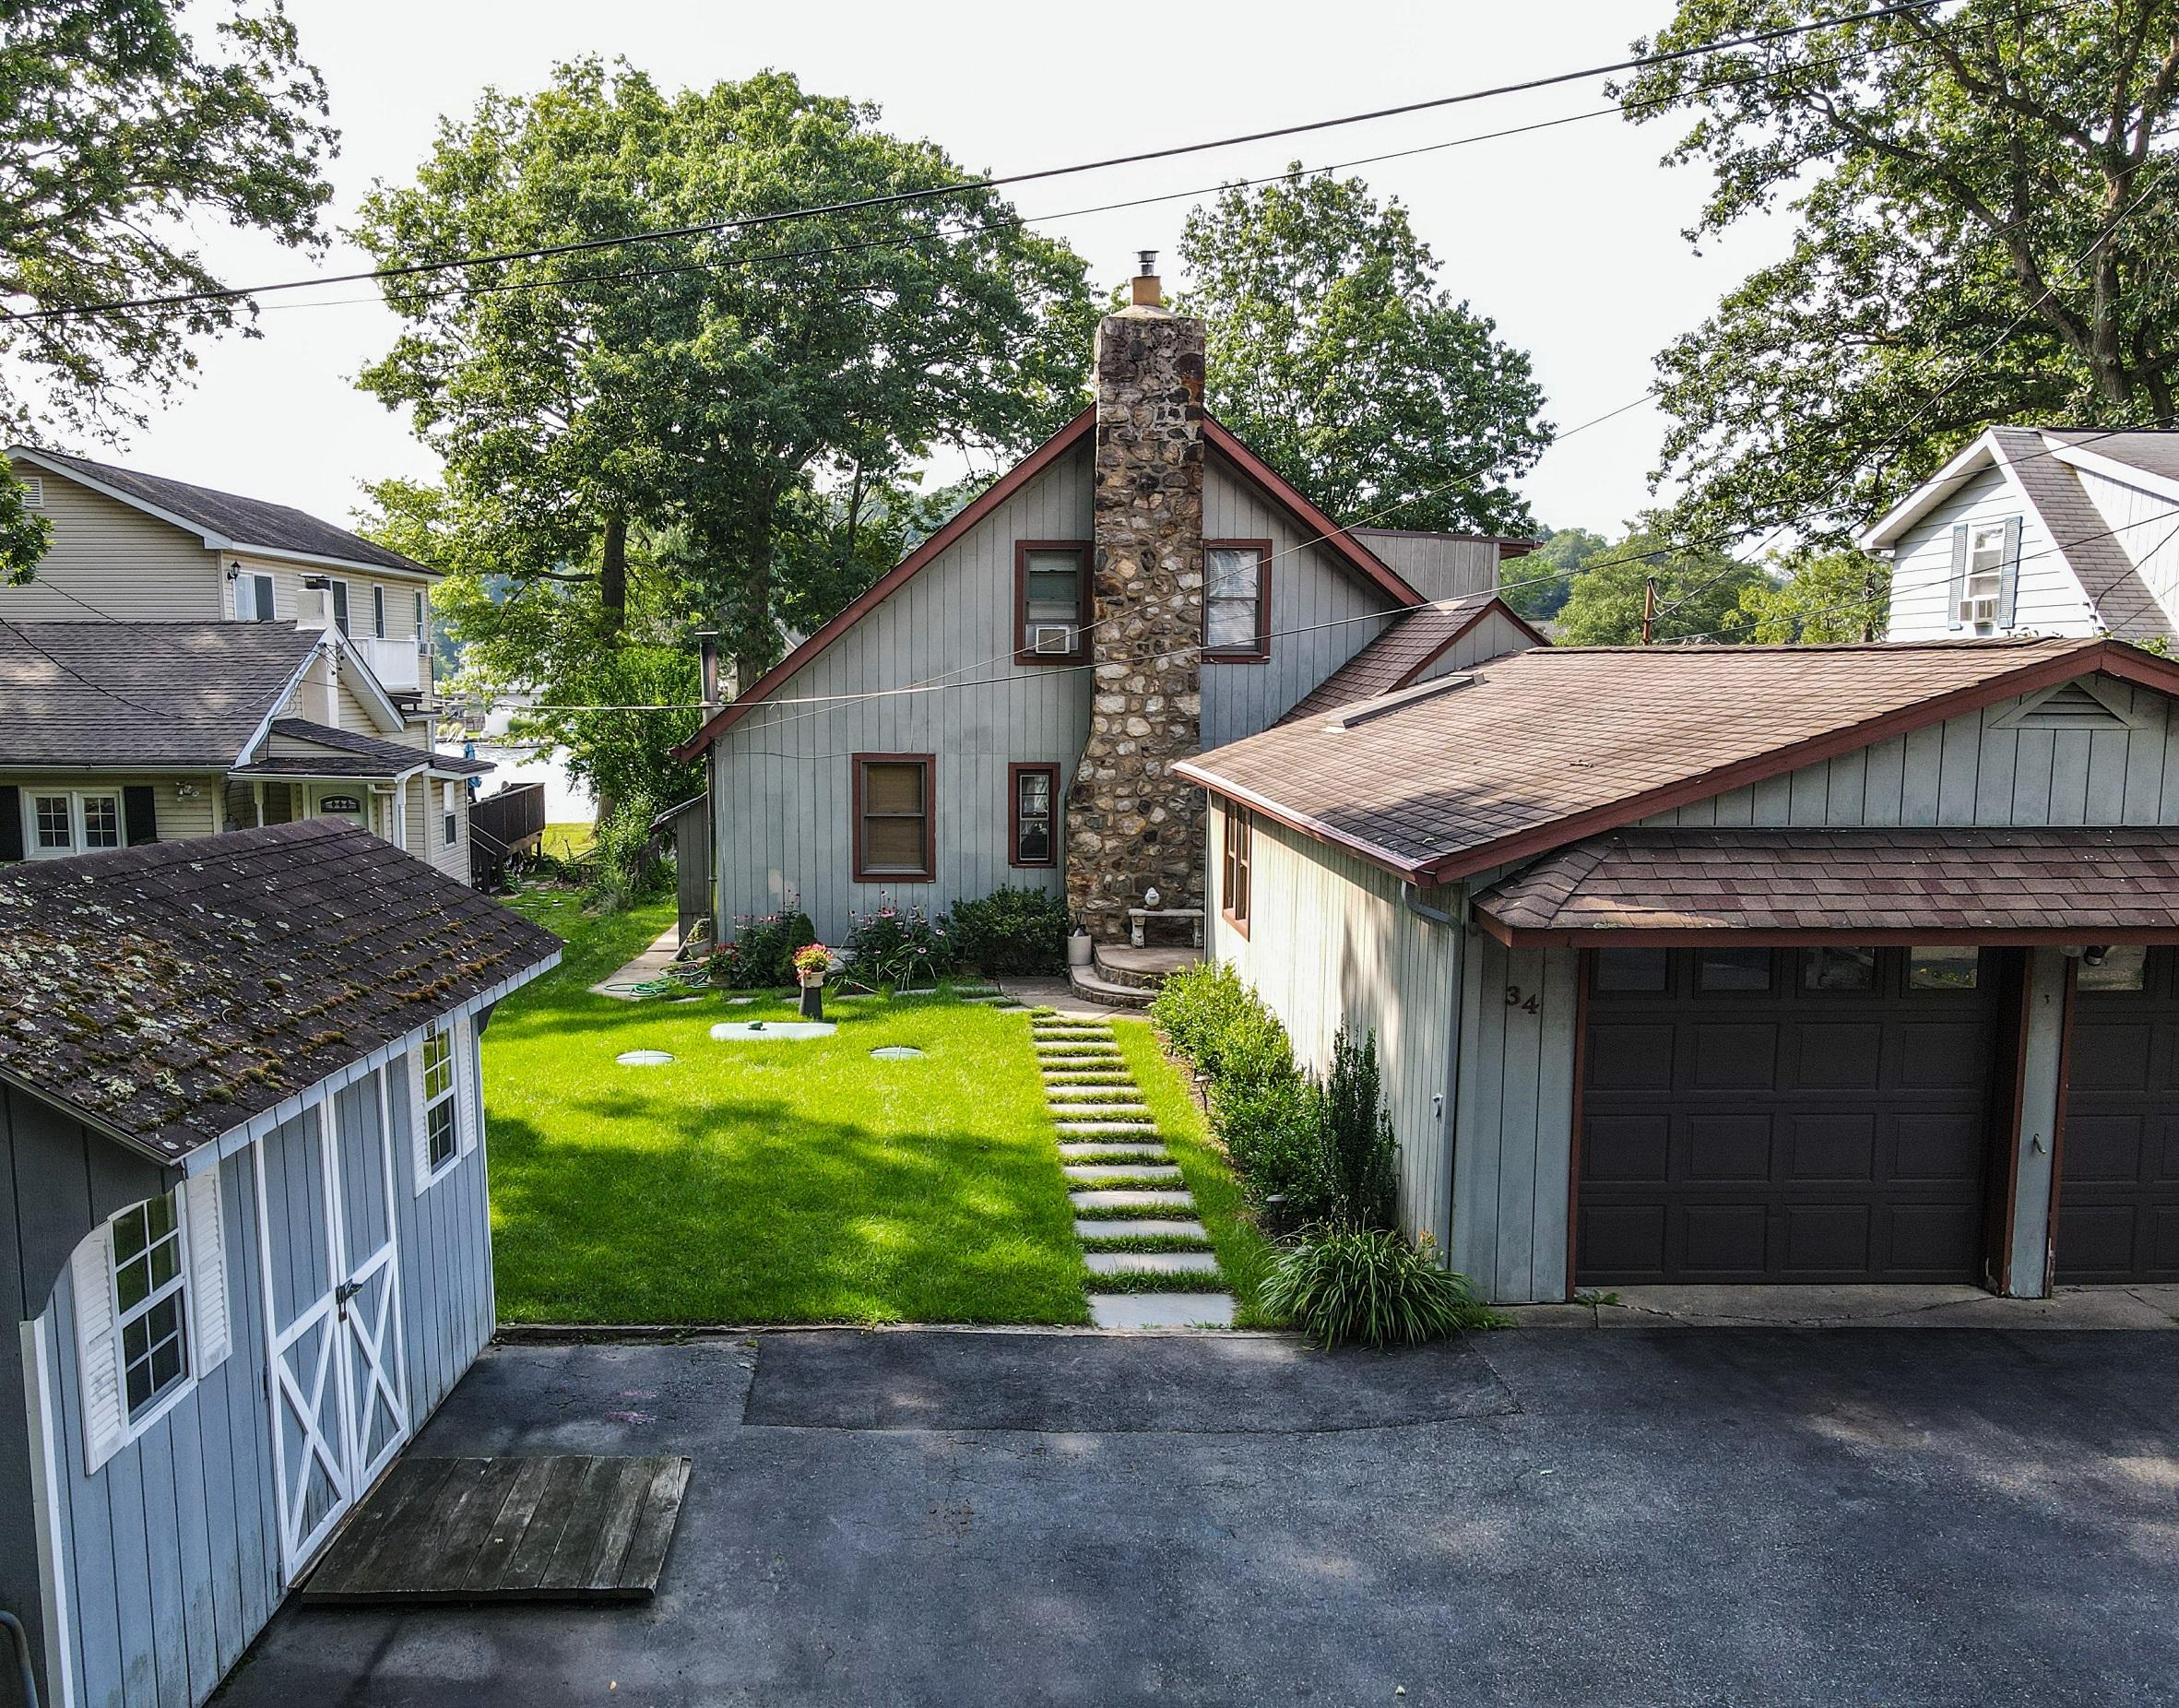 Lakefront home for sale Lake Hopatcong NJ